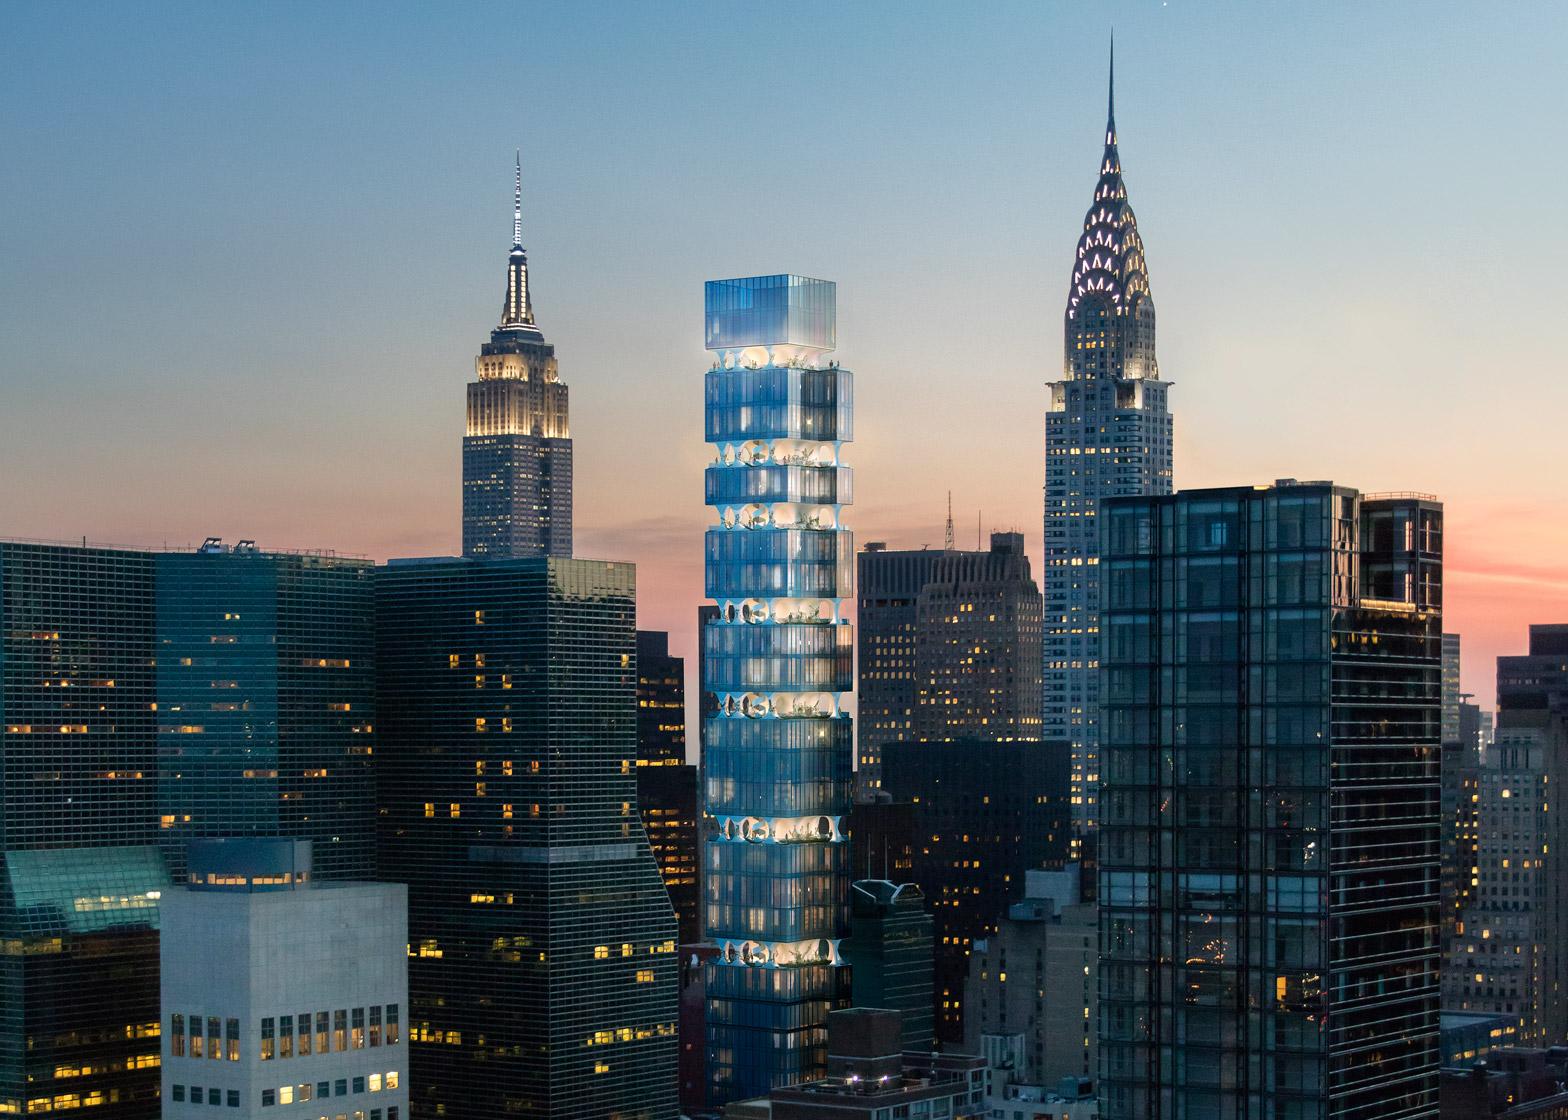 East 44th Street by ODA